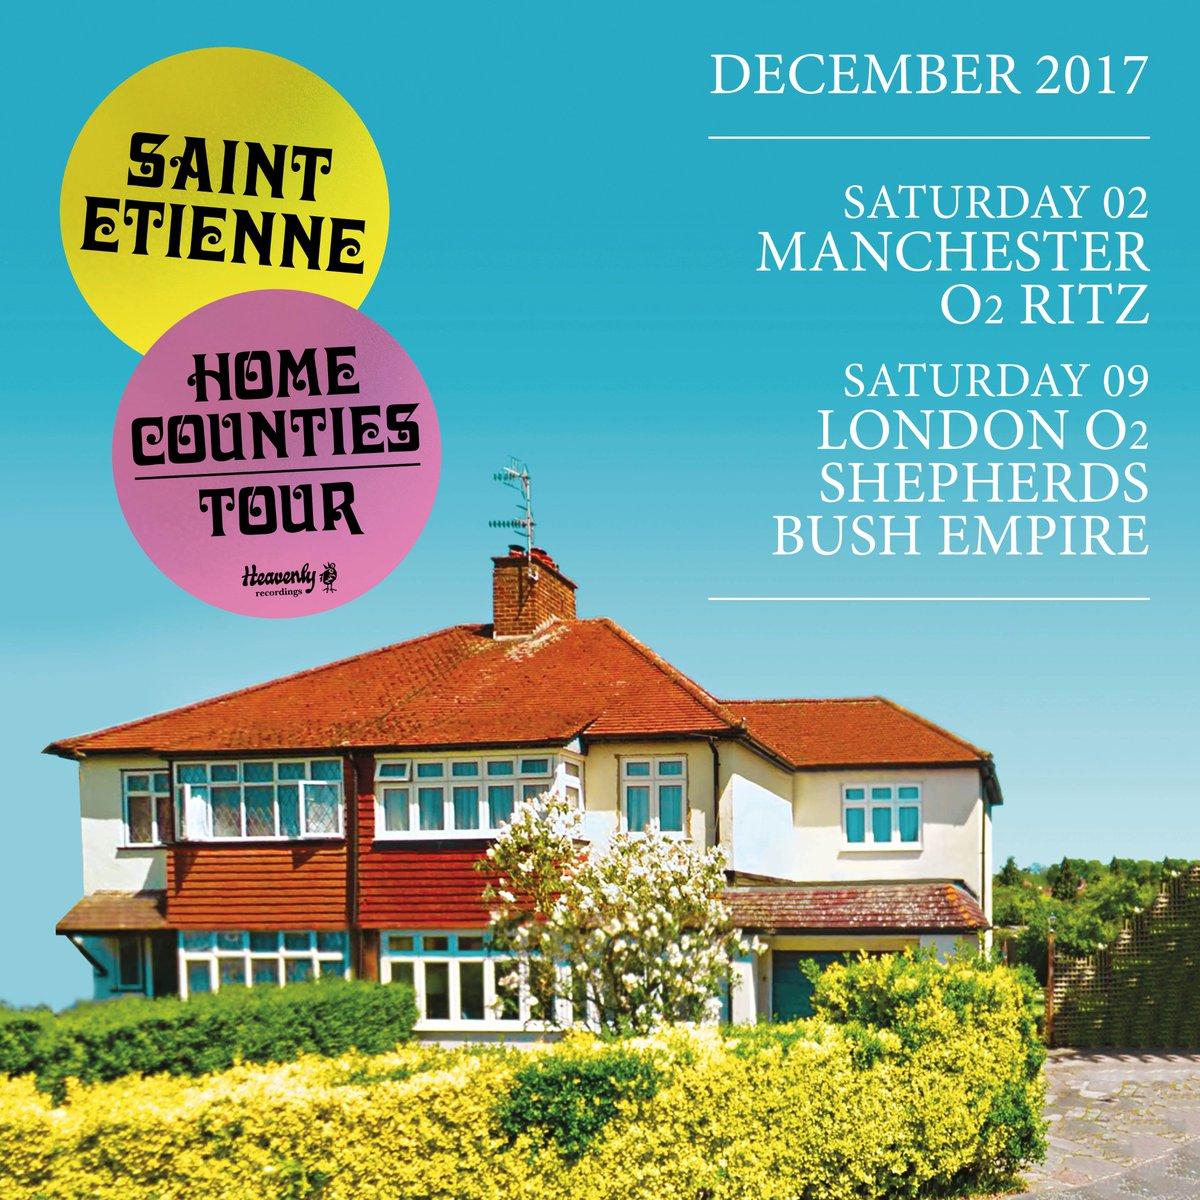 ANNOUNCE// #SaintEtienne (@bobpetesarah) have announced a MCR / LDN show this Dec! Tix on sale Fri @ 9:  http:// gigst.rs/SaintEt  &nbsp;  <br>http://pic.twitter.com/7uT4sR0rcJ